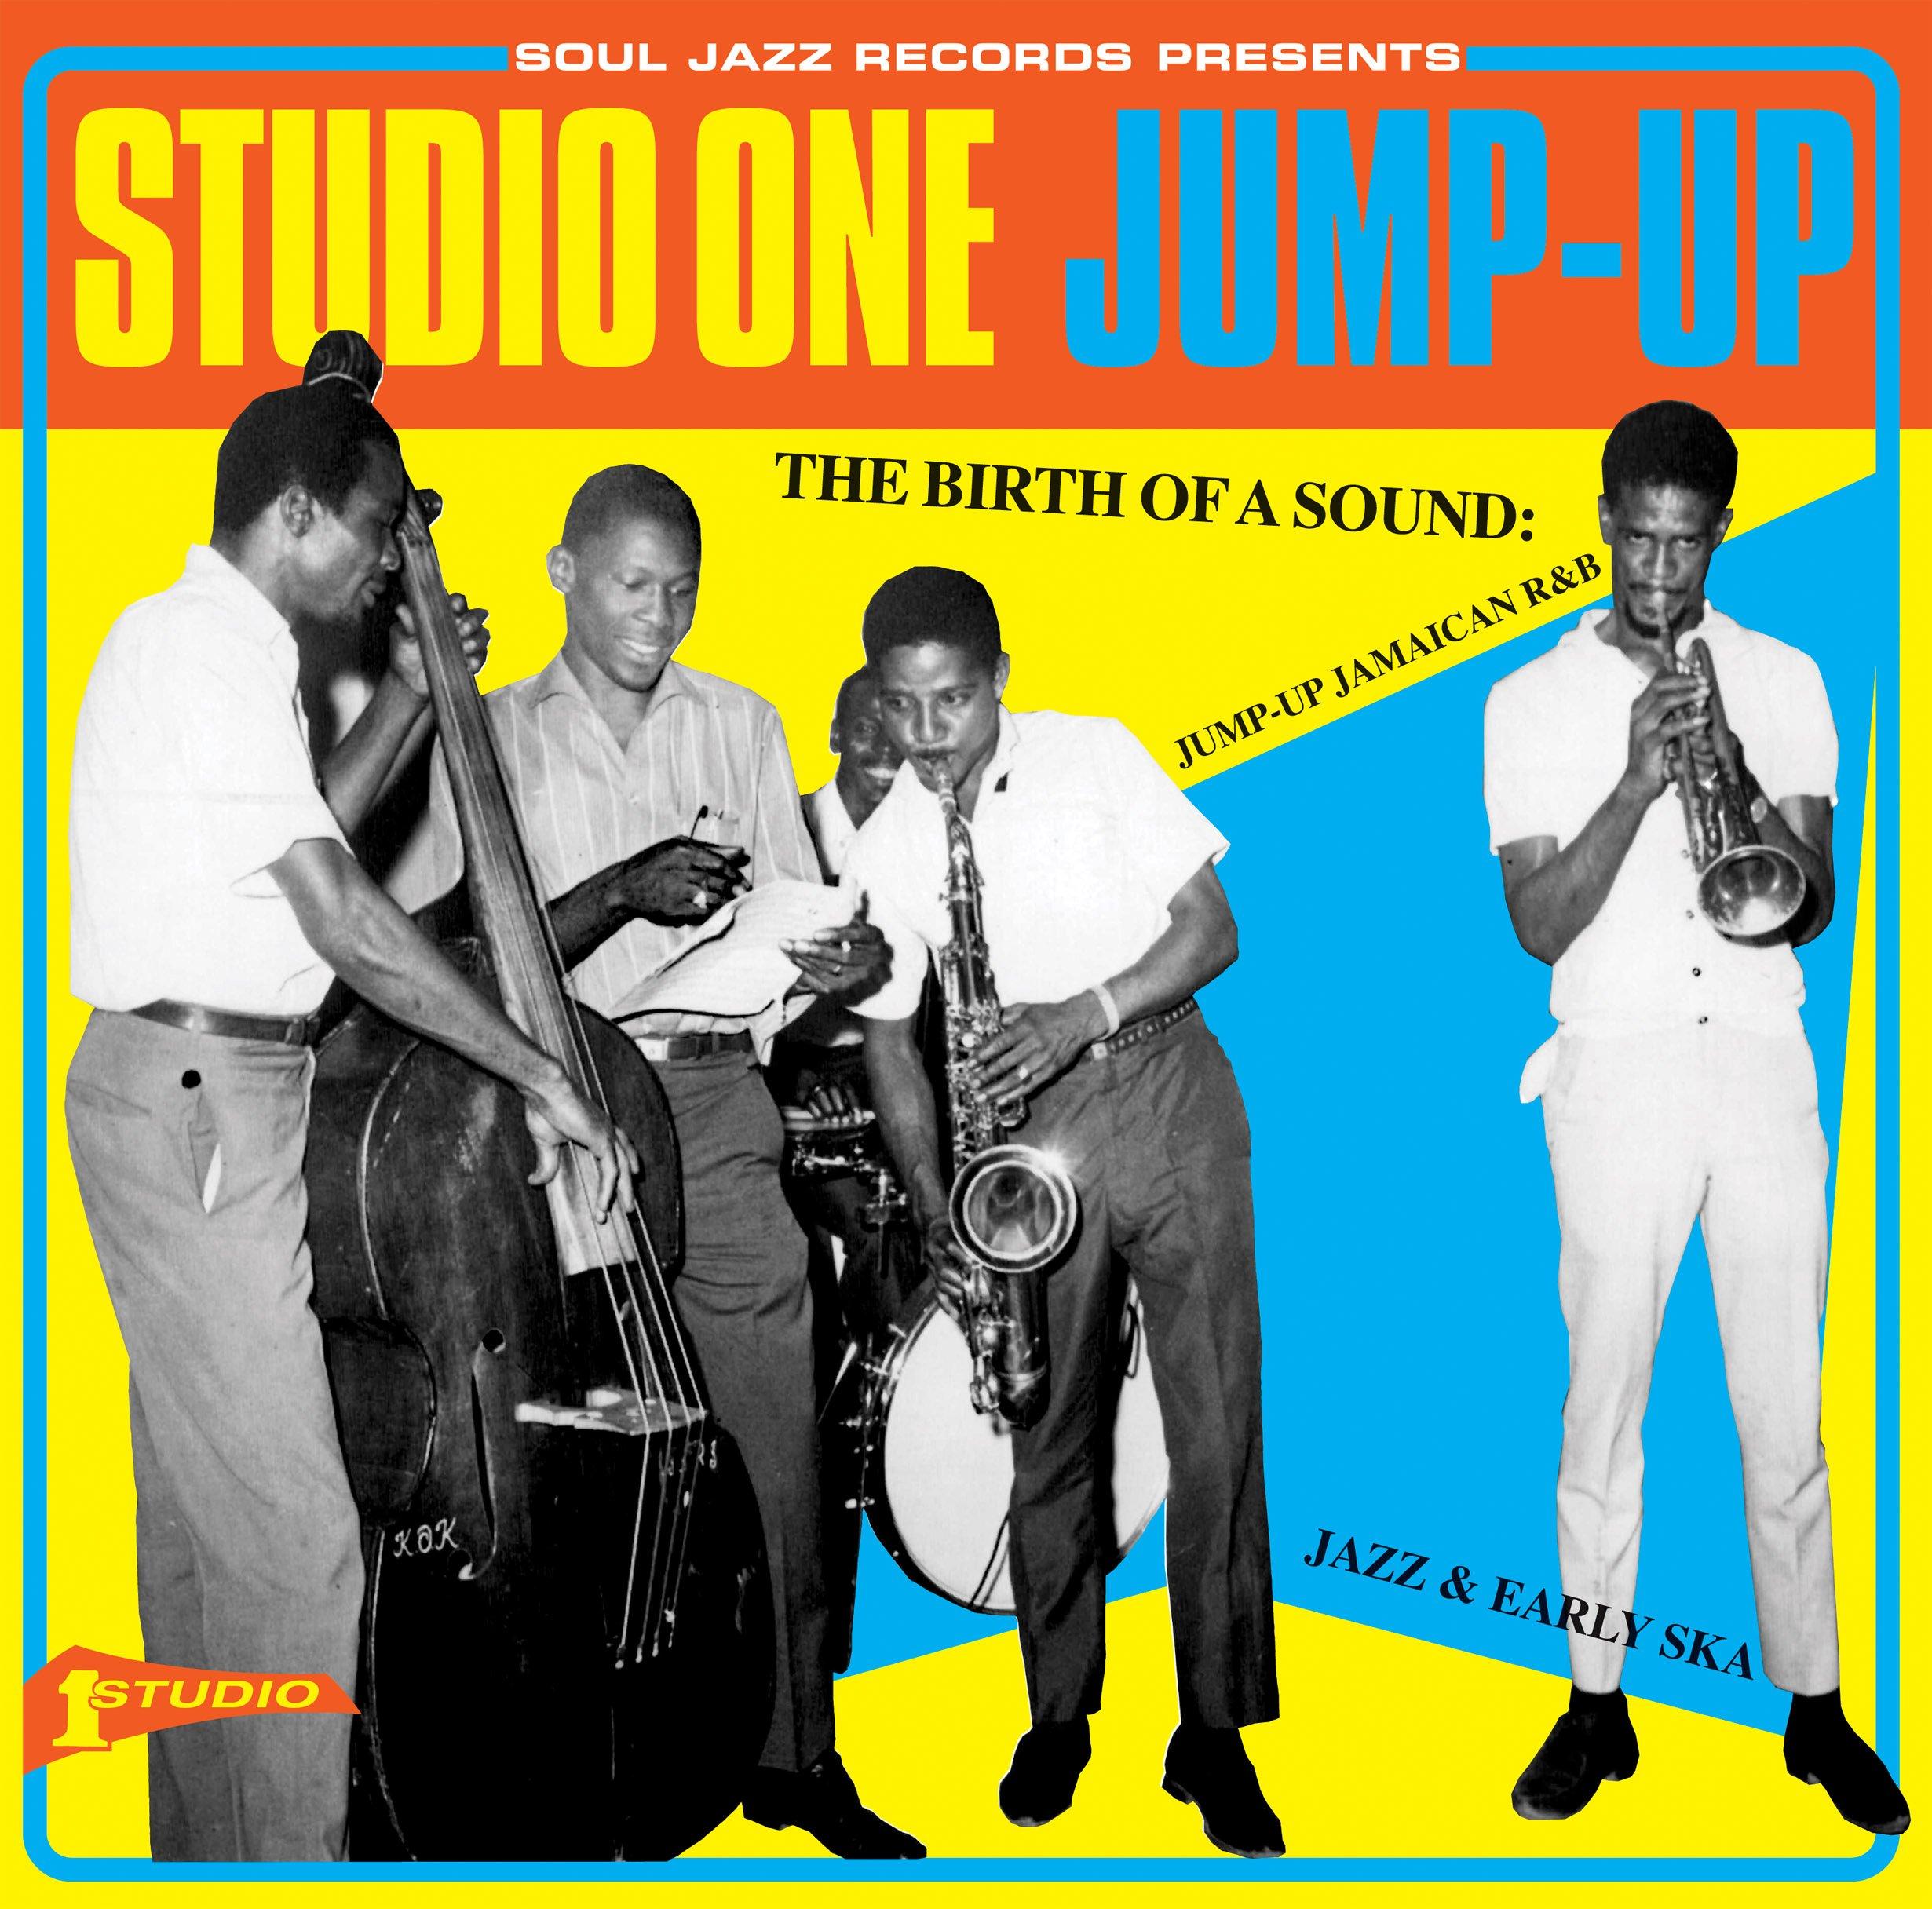 VA - Studio One Jump-Up-2015-GrindsMan Download